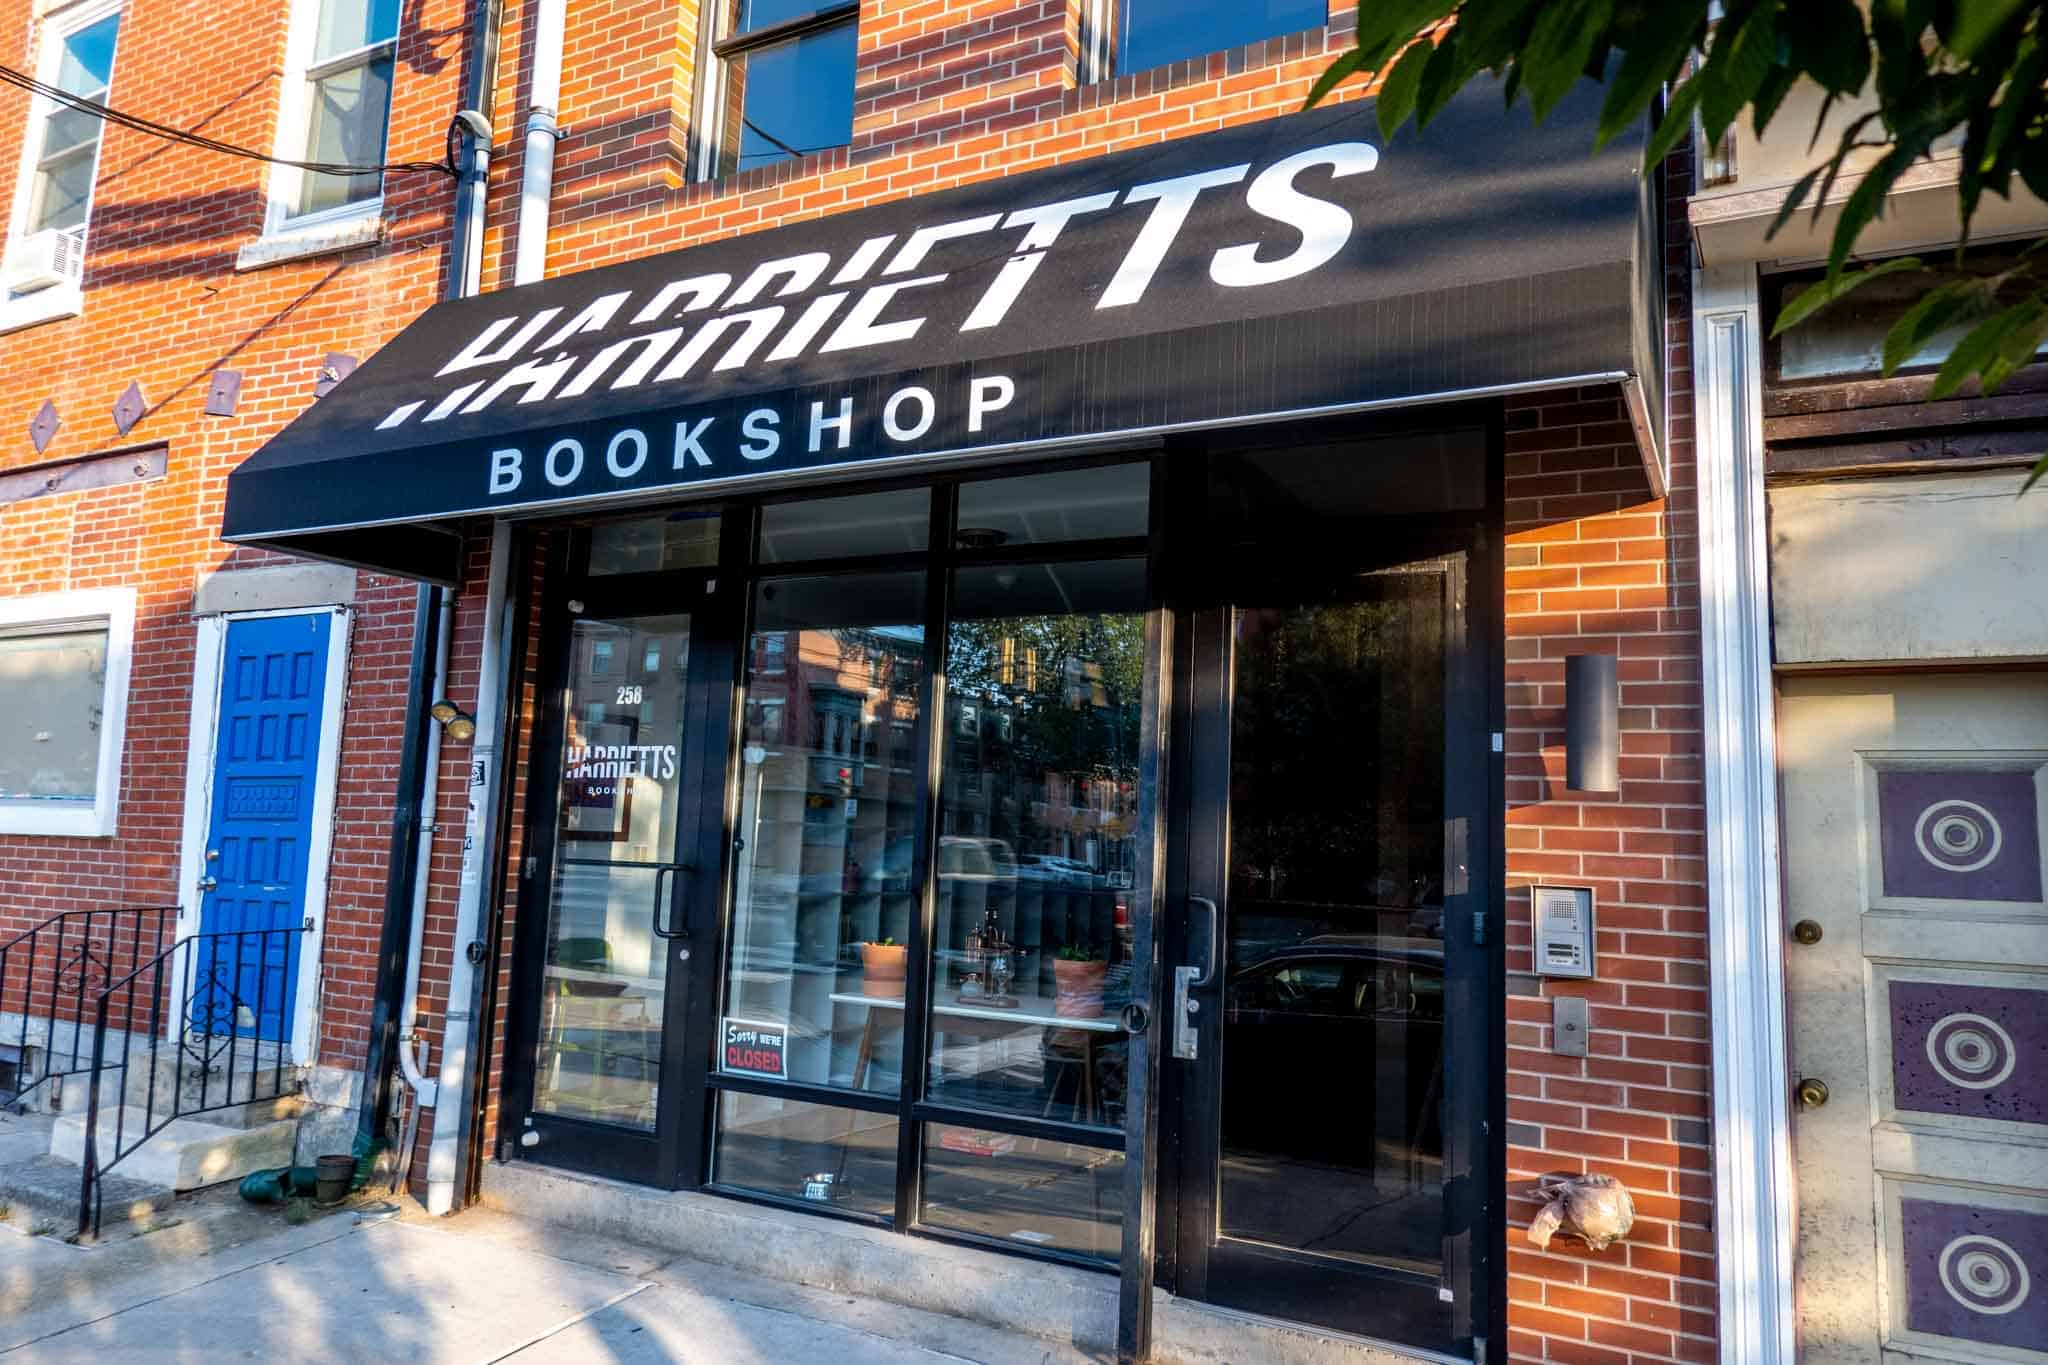 Exterior of Harriett's Bookstore